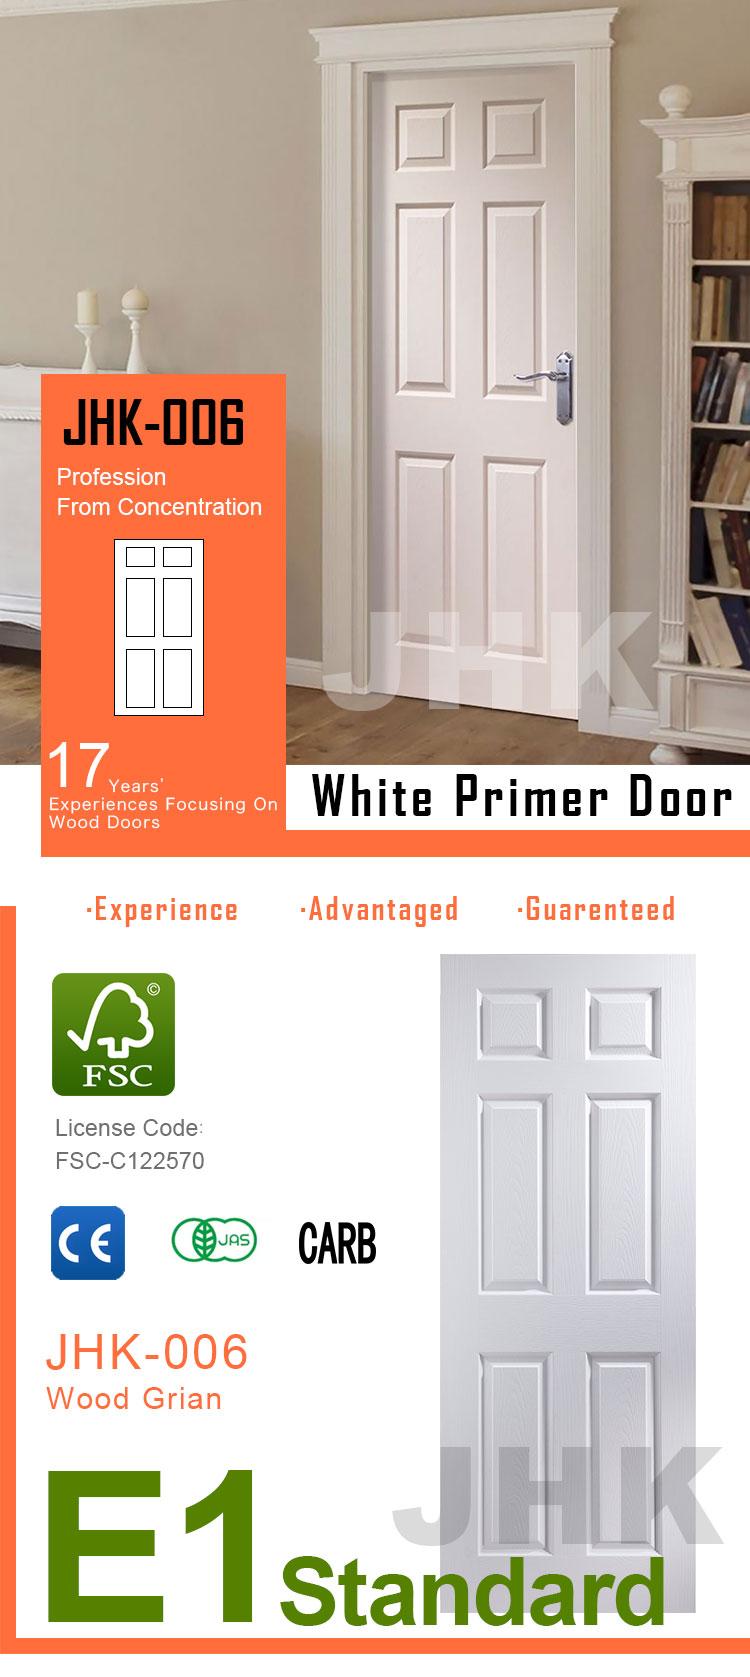 Jhk-006 6 Panel Goedkope Hollow Core Binnendeuren Witte Primer ...